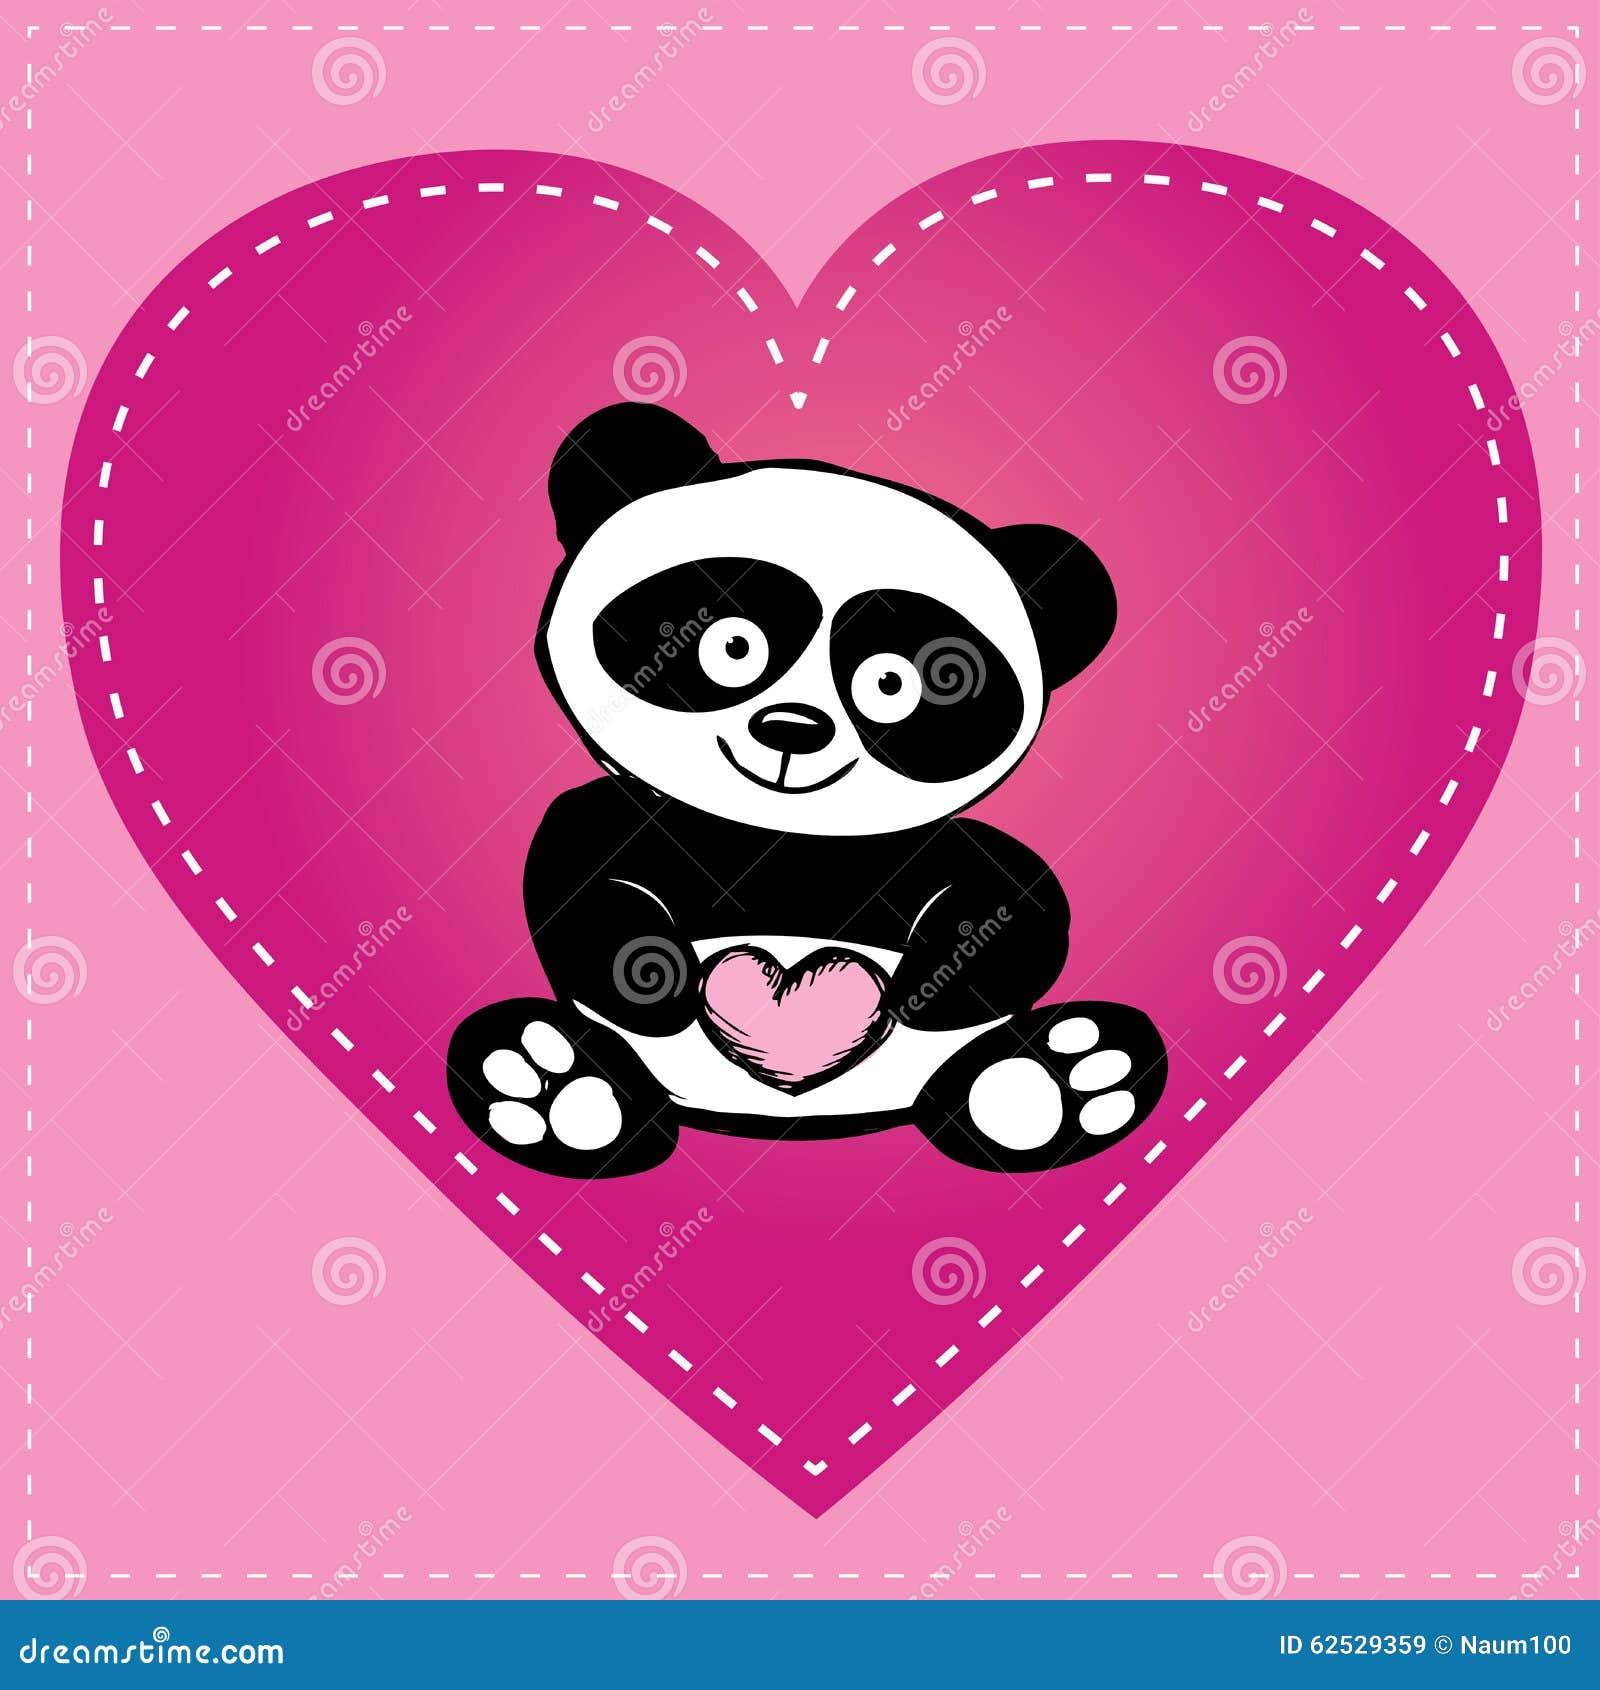 Petit Panda Mignon Au Coeur Dessin De Main Illustration De